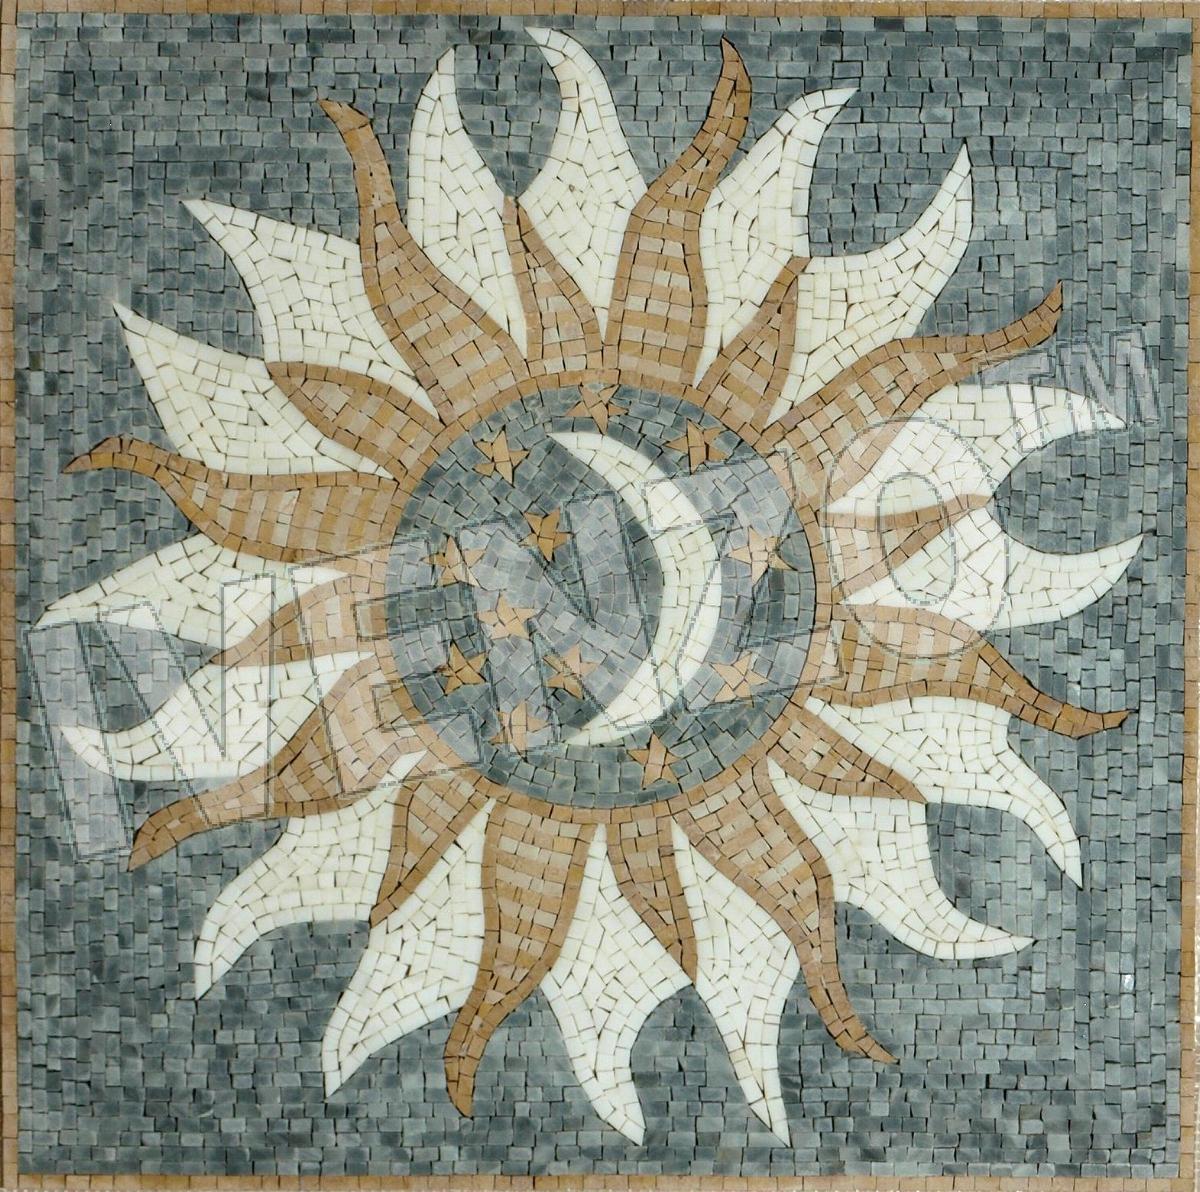 Mosaik Sonne Mond Sterne GK001